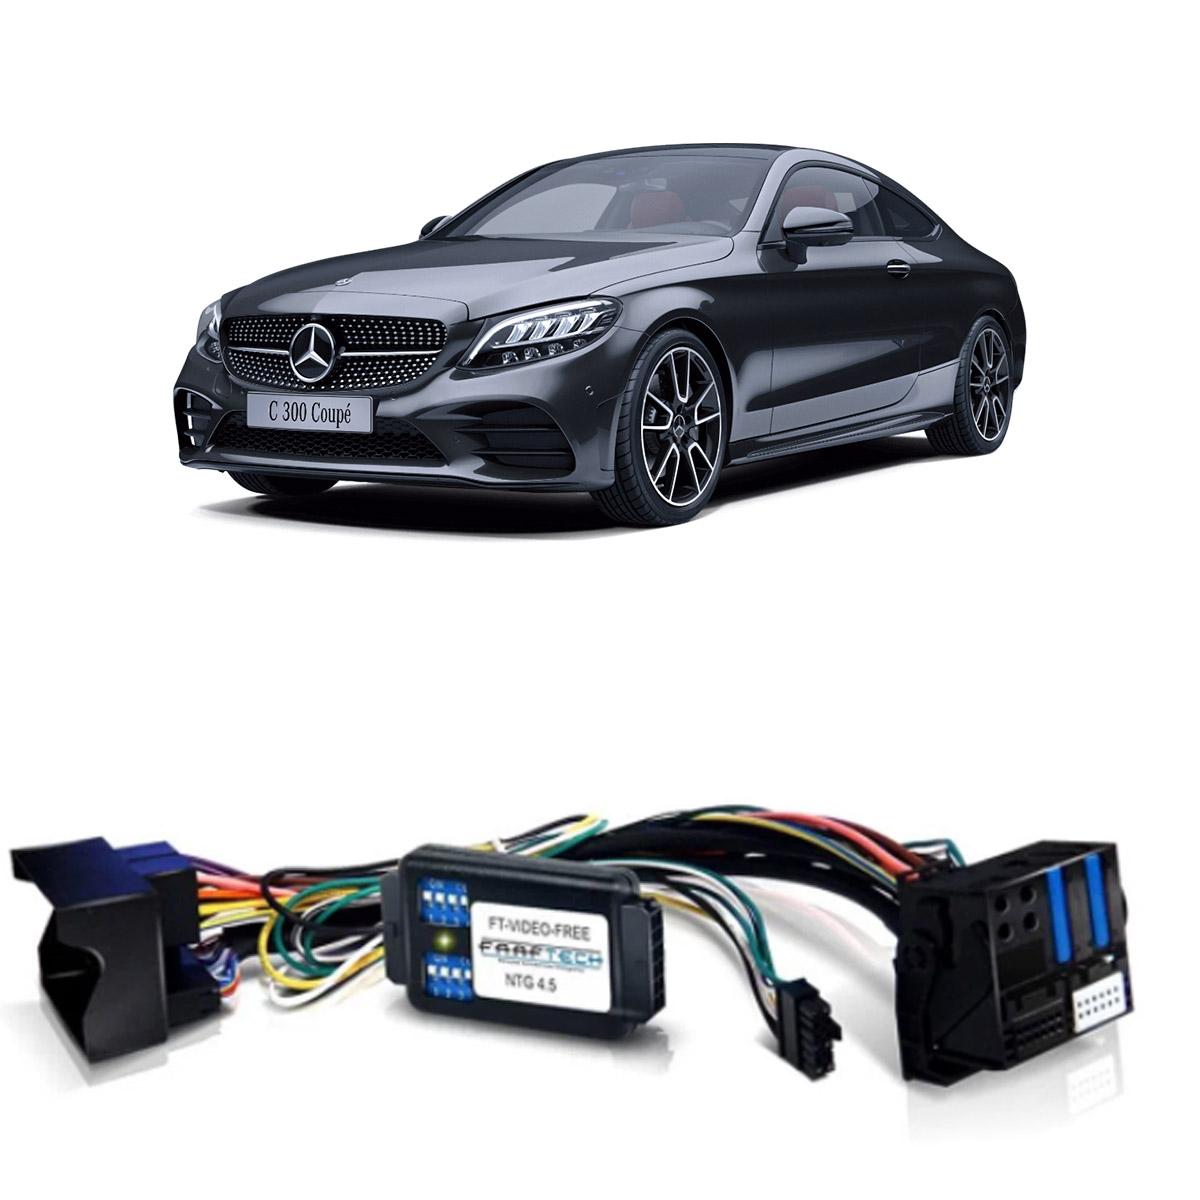 Desbloqueio De Multimidia Mercedes Faaftech FT VF NTG4.5